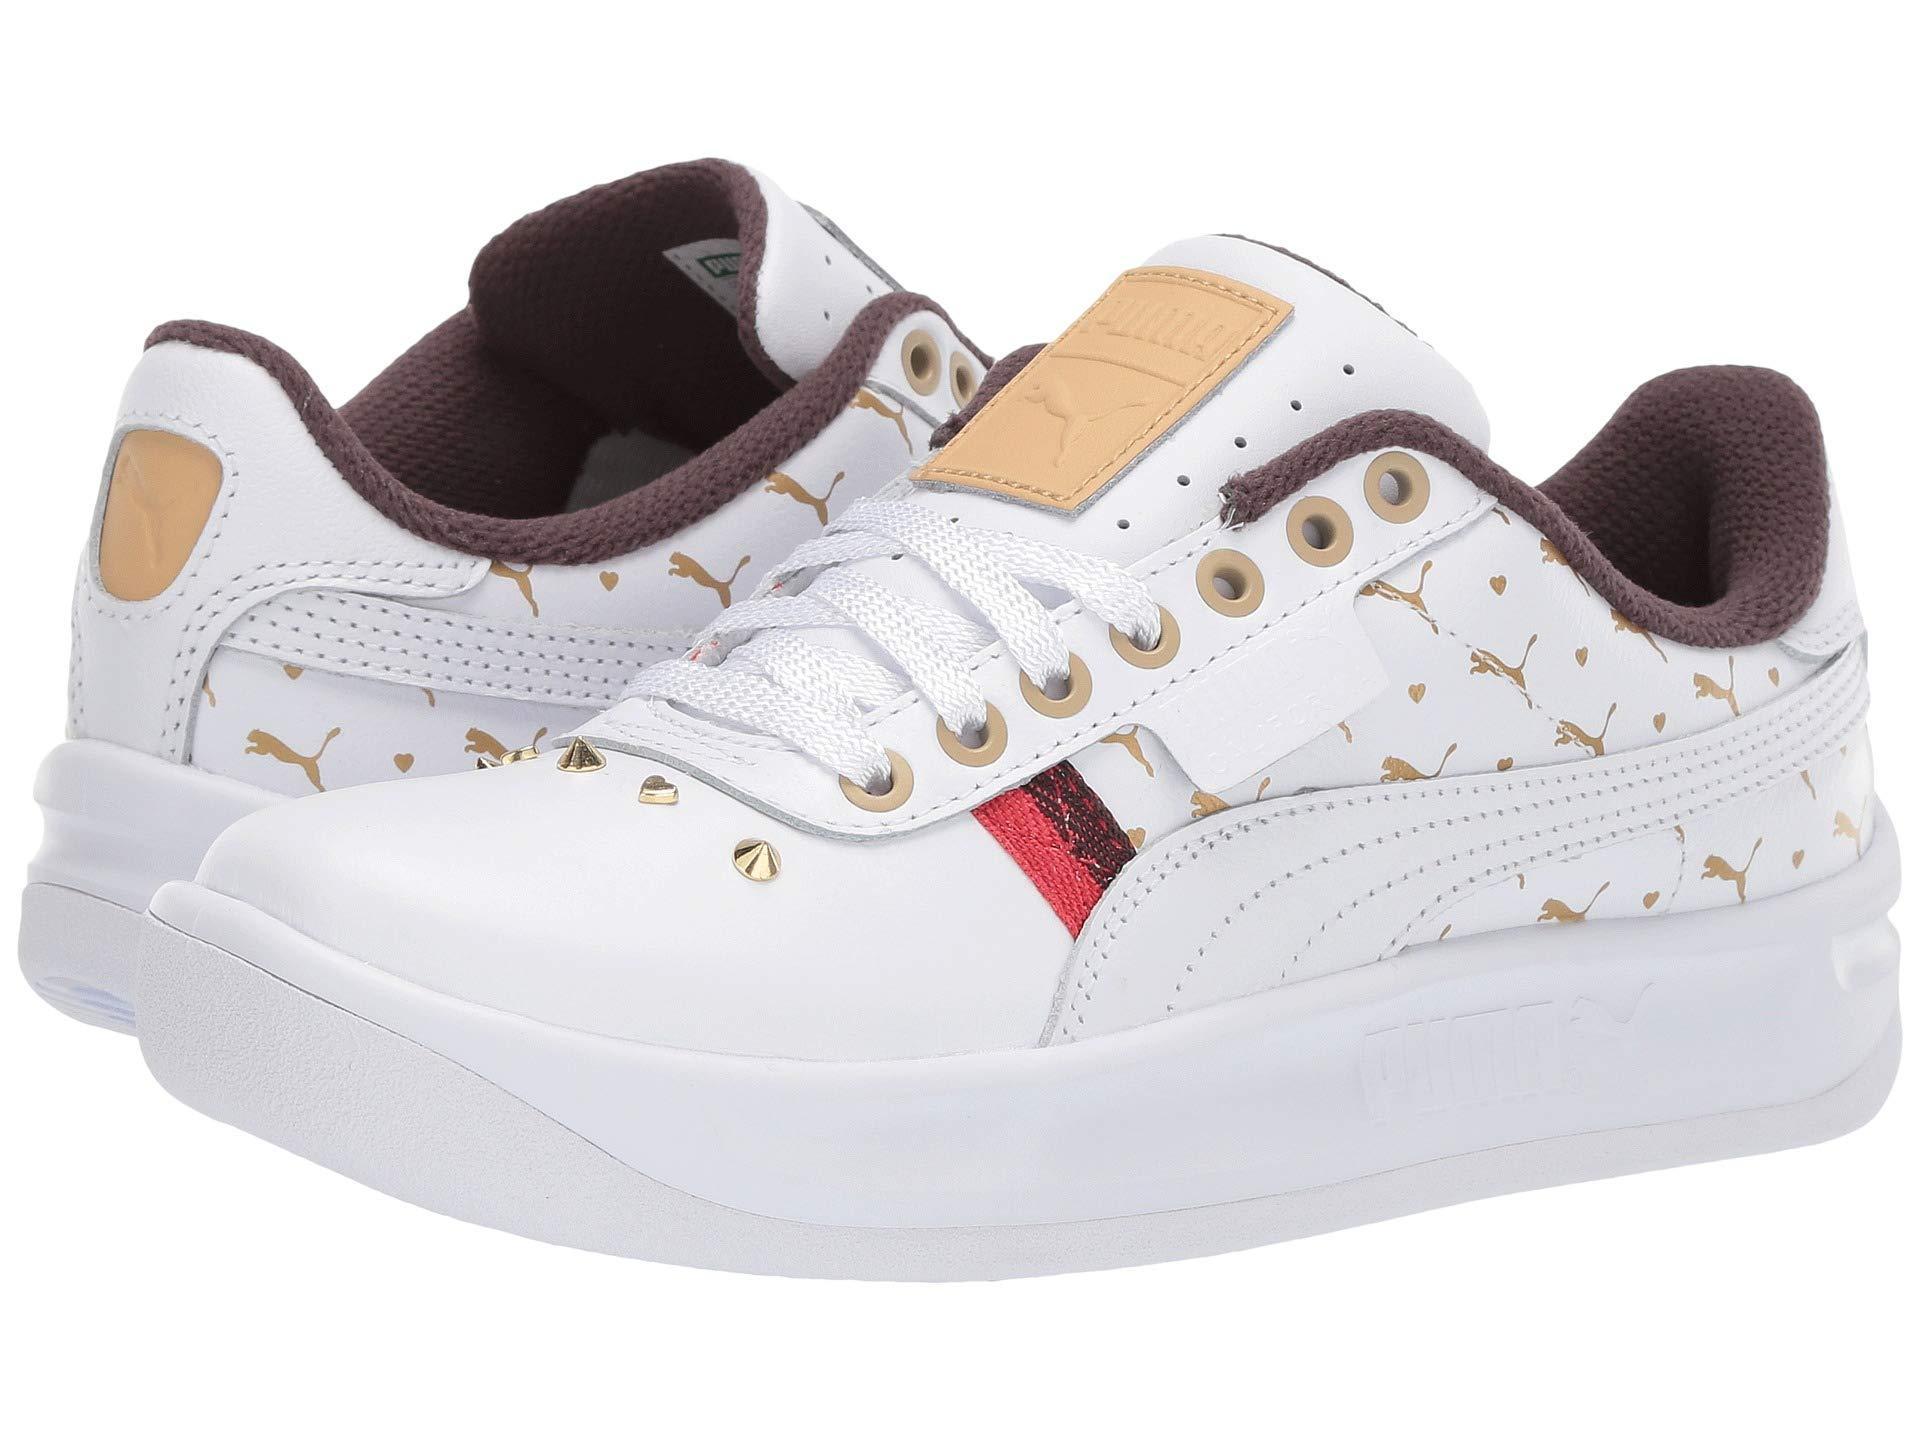 Lyst - PUMA California Studs ( White) Women s Shoes in White 3fe19e22b4